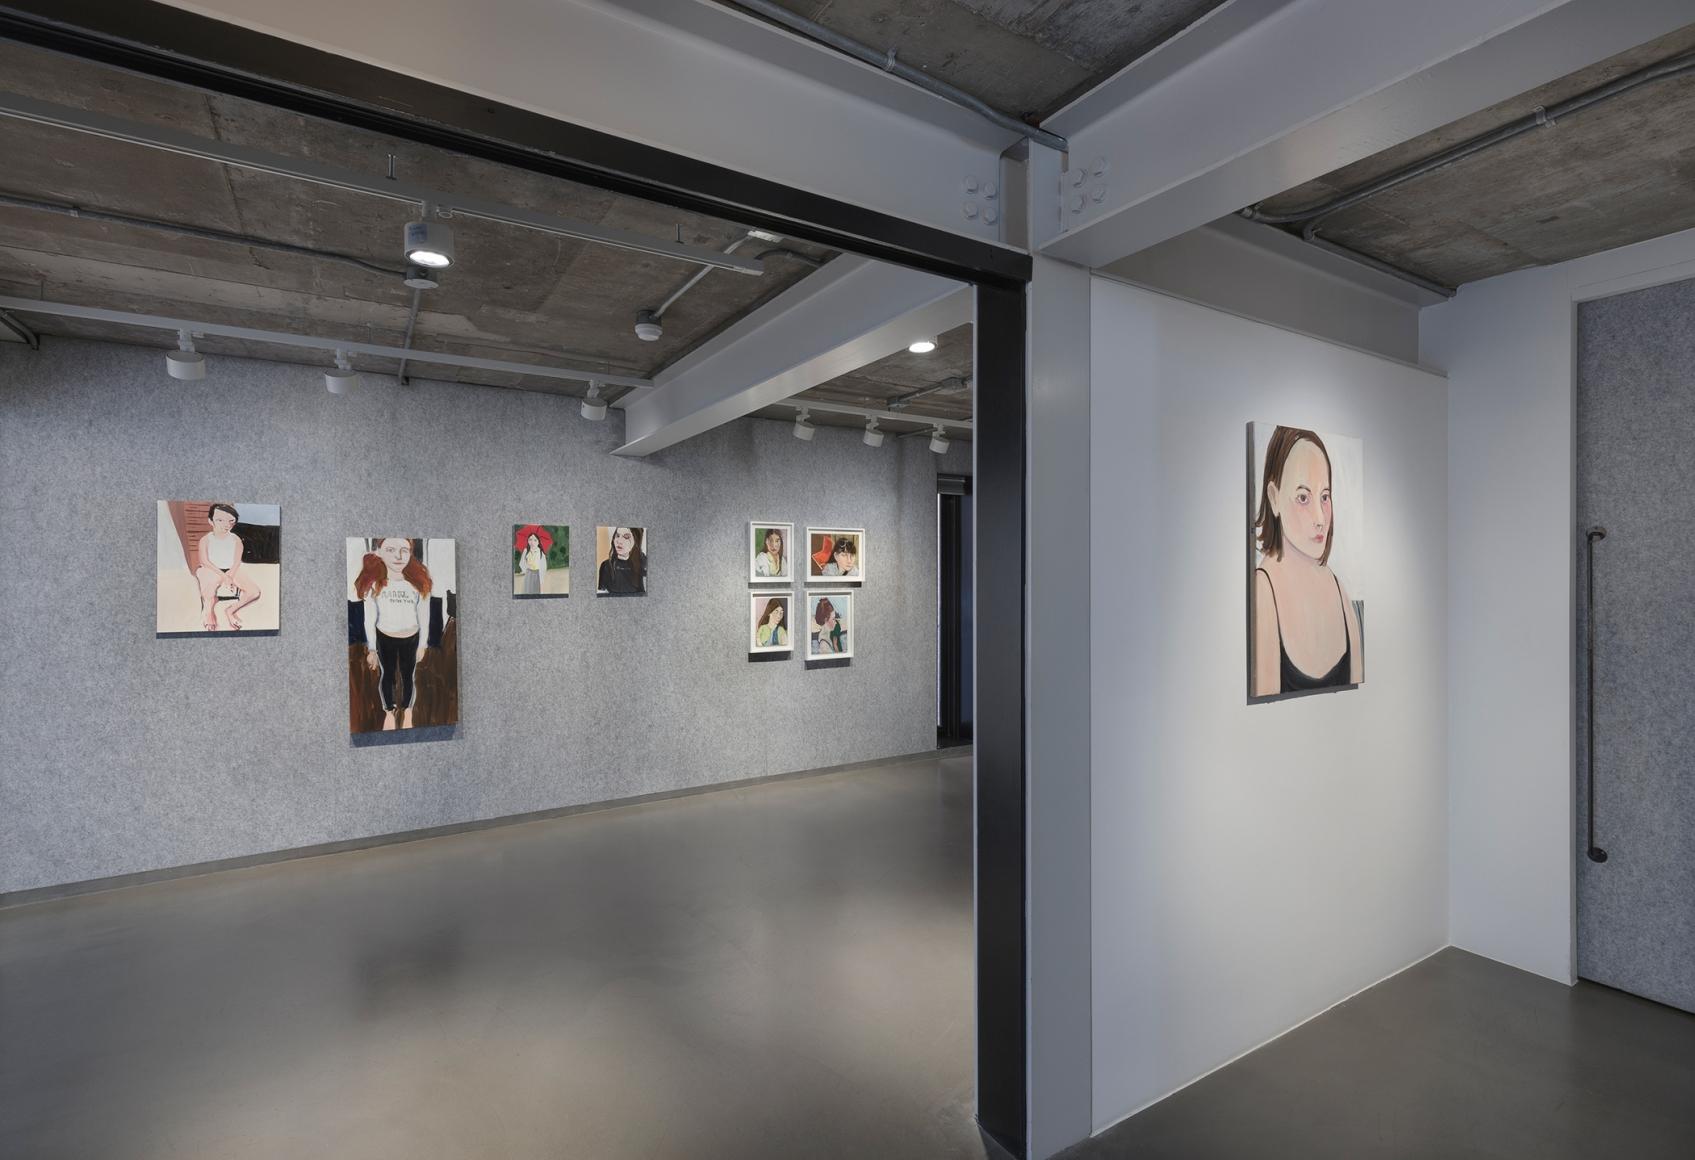 Chantal Joffe,Teenagers, Installation view, Lehmann Maupin, Seoul, 2020